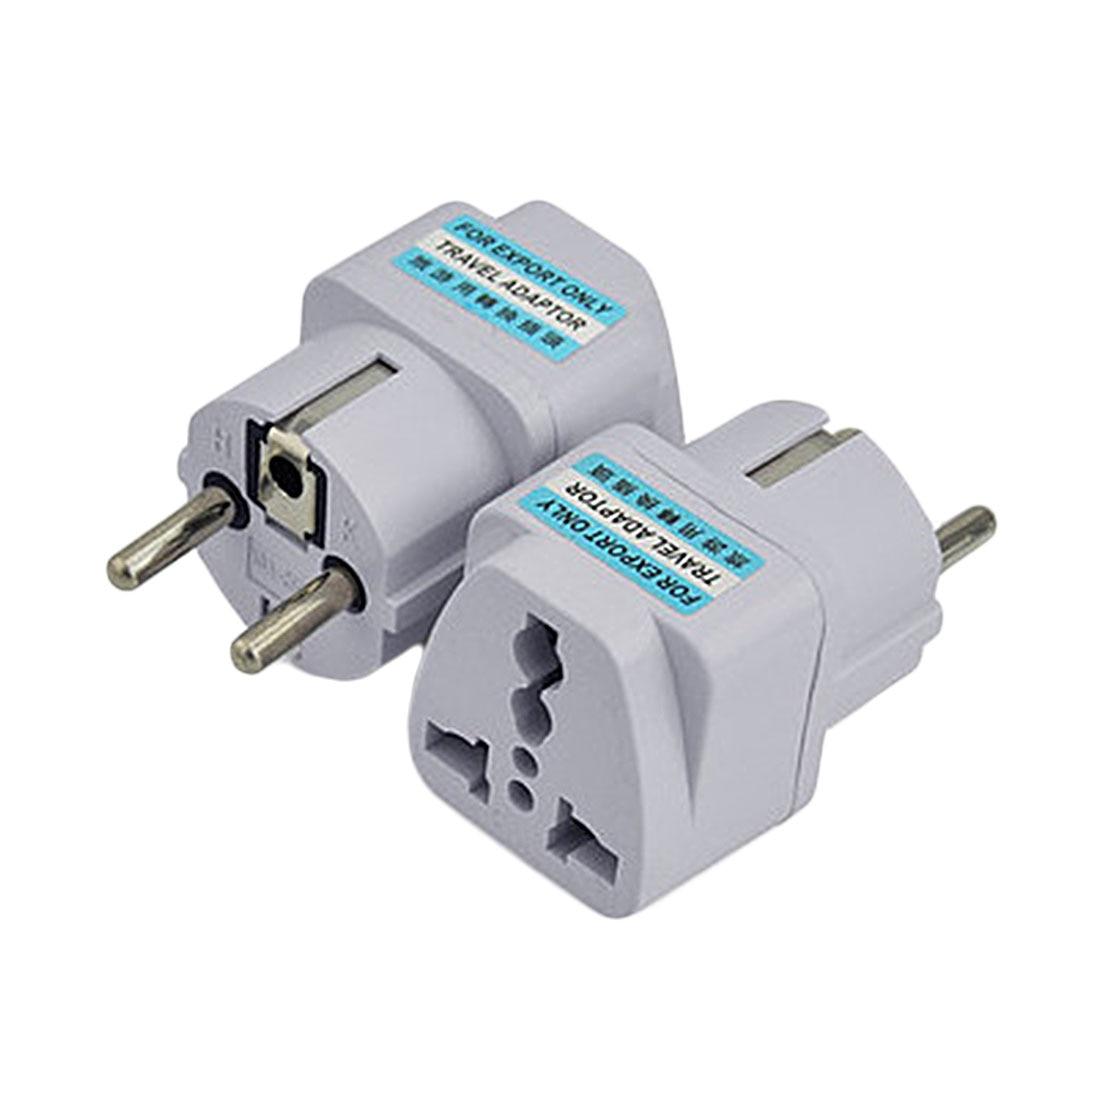 MAIF Universal UK US AU to EU AC Power Plug Universal Travel Charger Adapter Converter